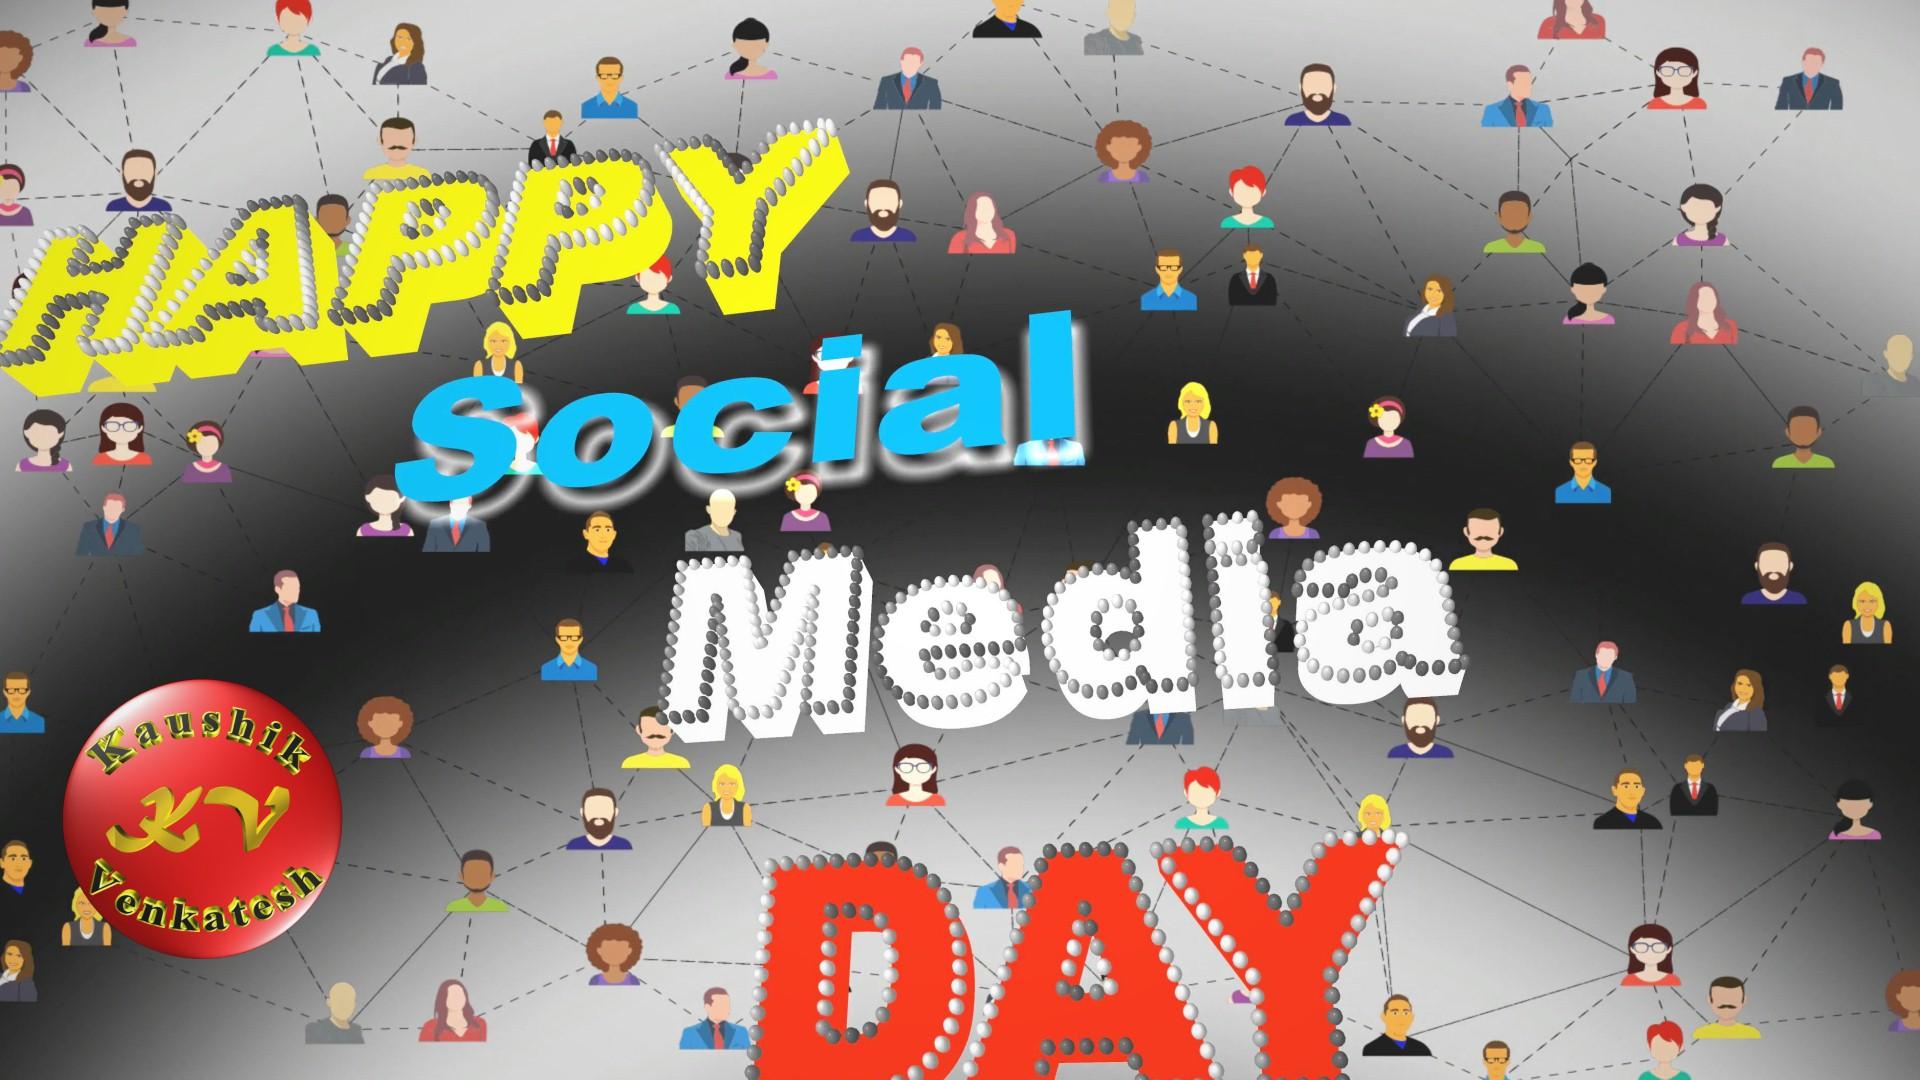 Greetings Image of Happy Social Media Day Status